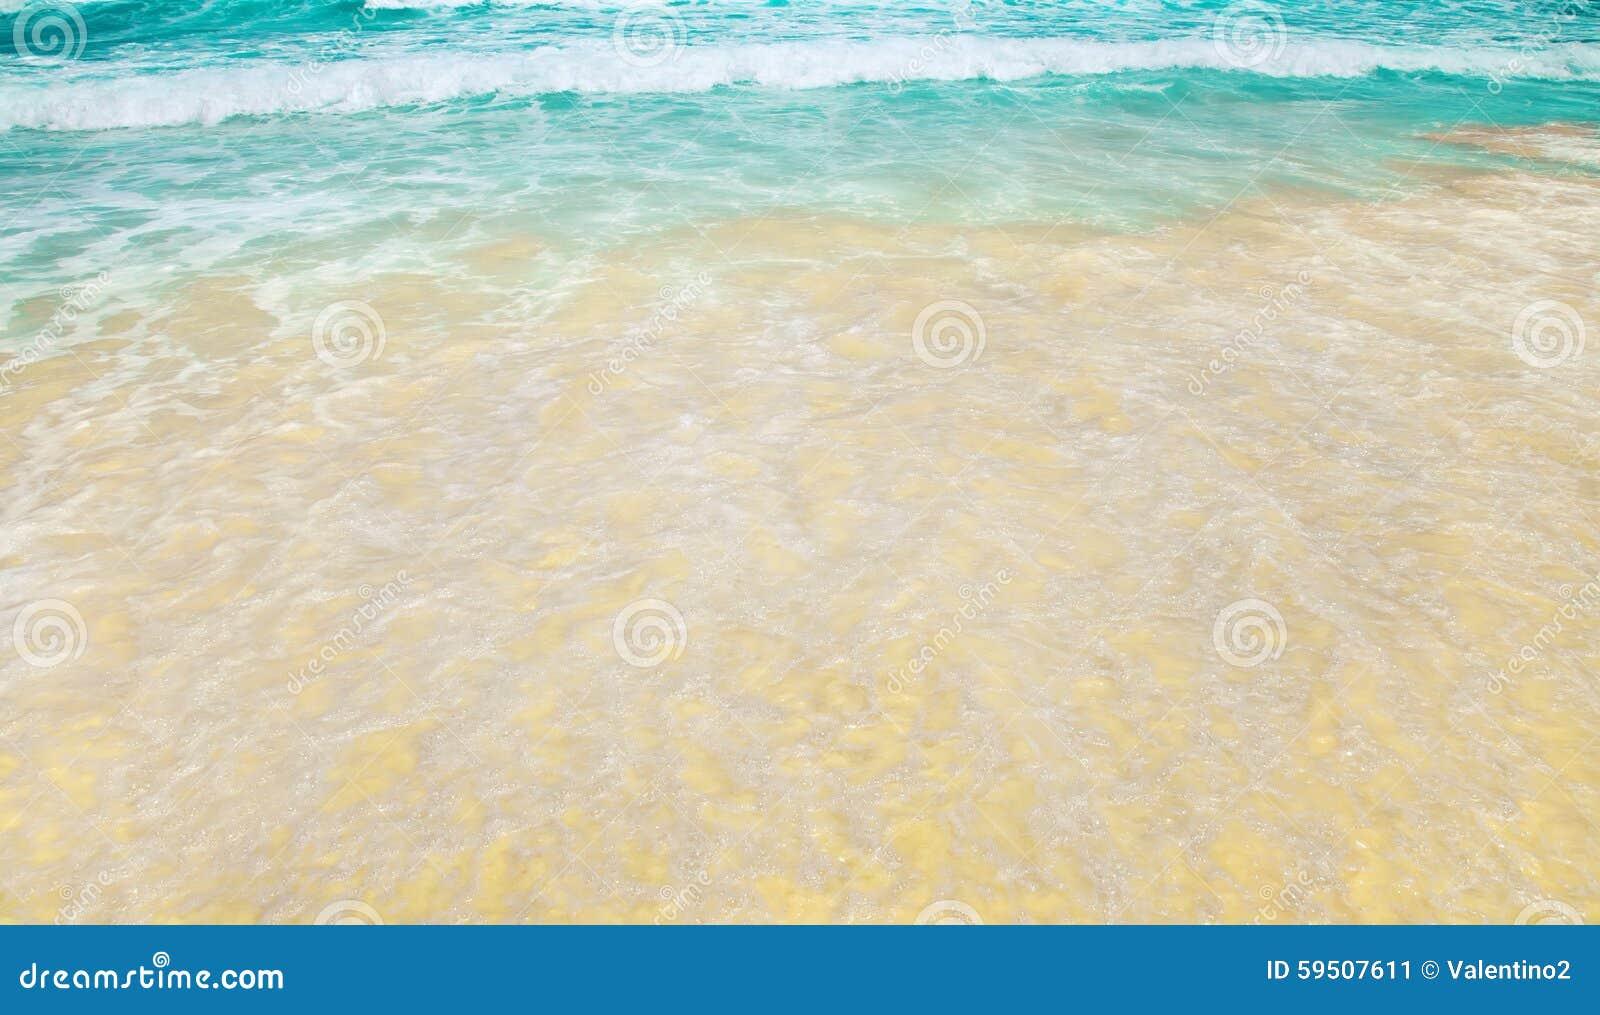 how to clean beach sand